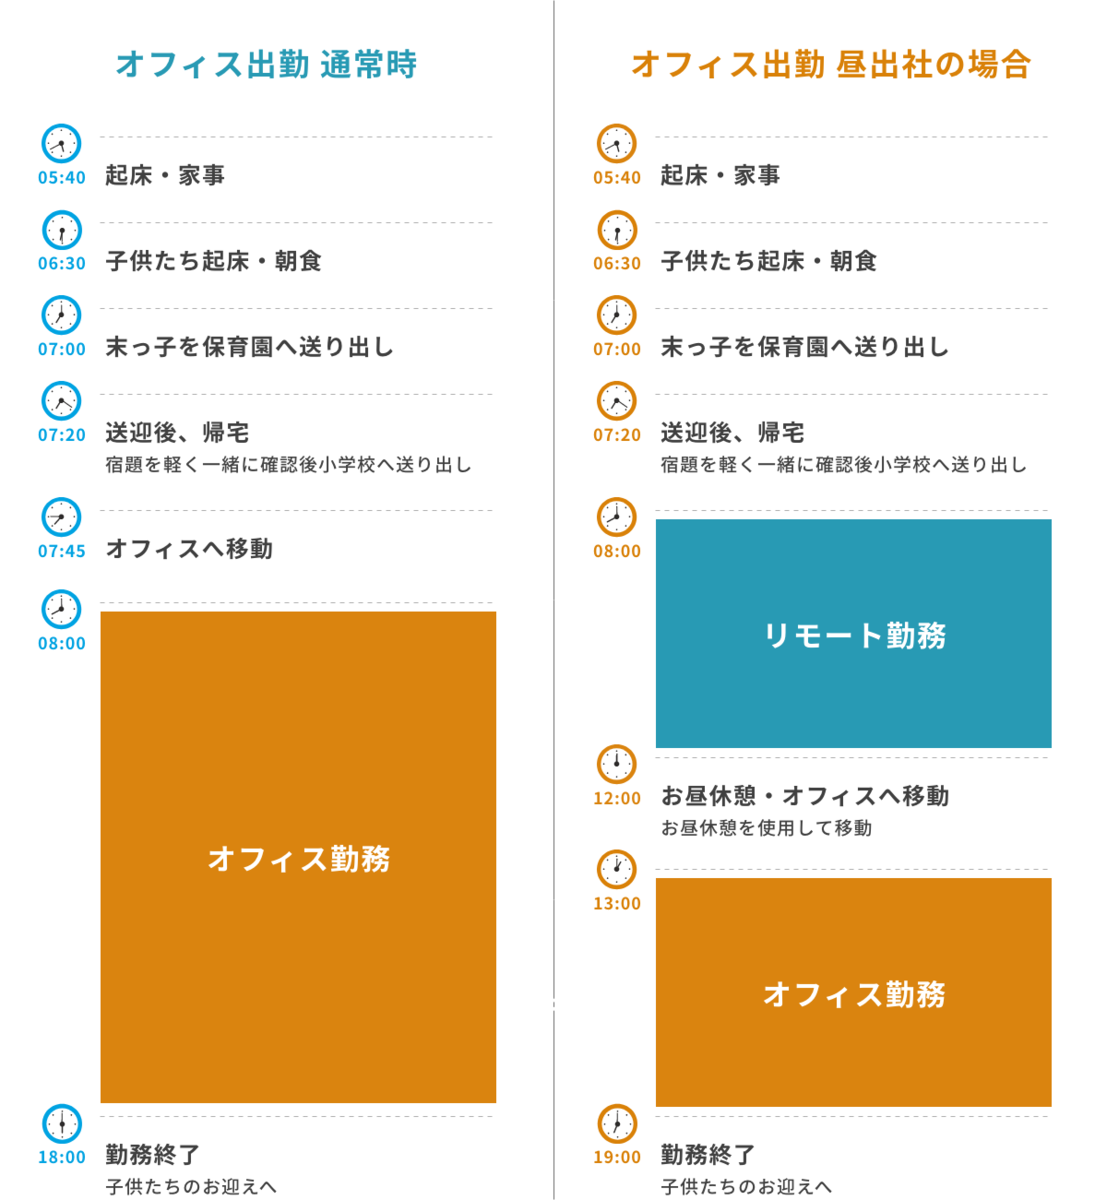 f:id:yuri_terao:20201223181945p:plain